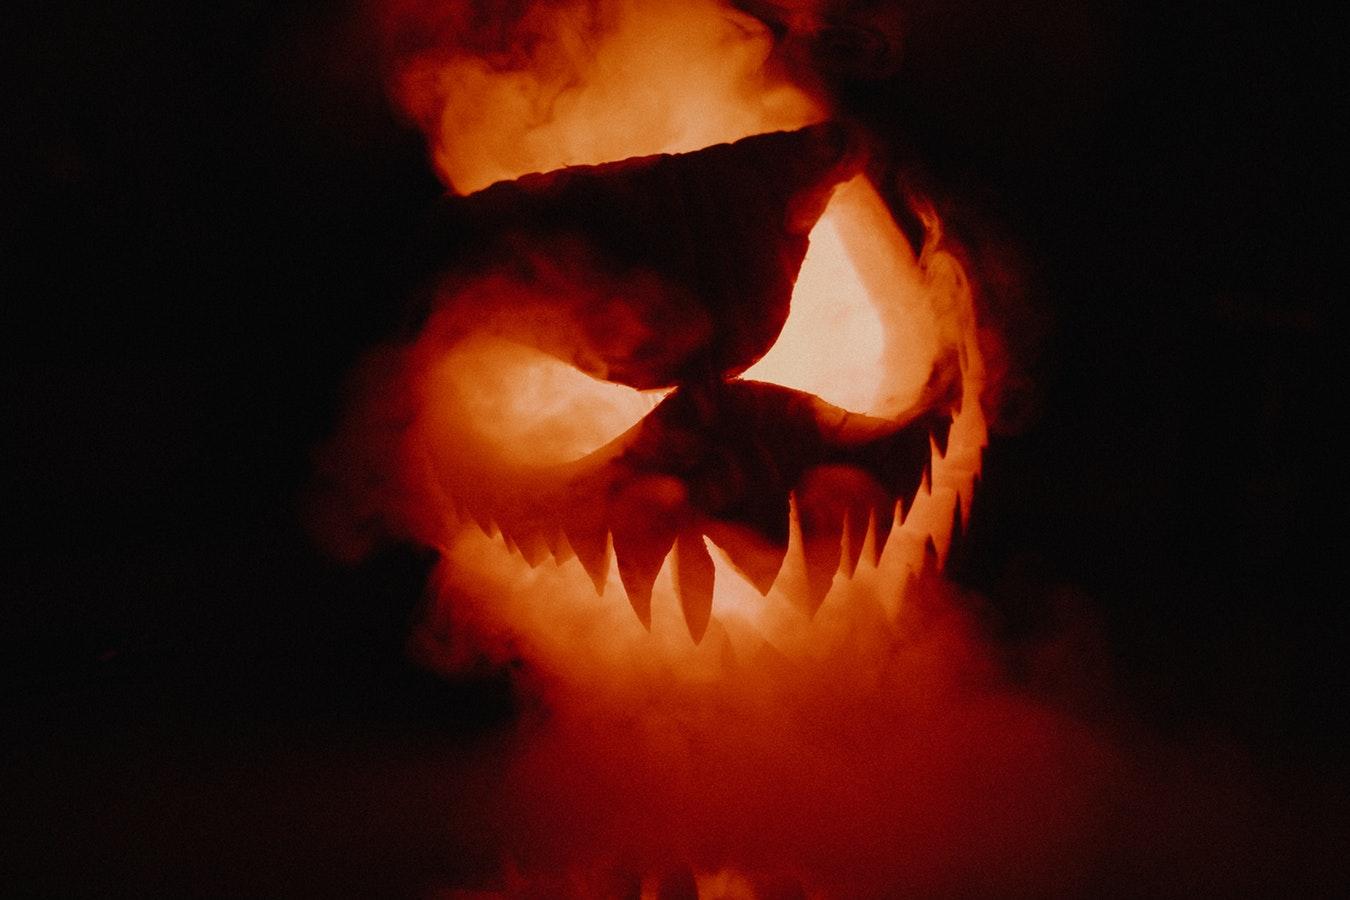 An evil looking jack-o-lantern on fire